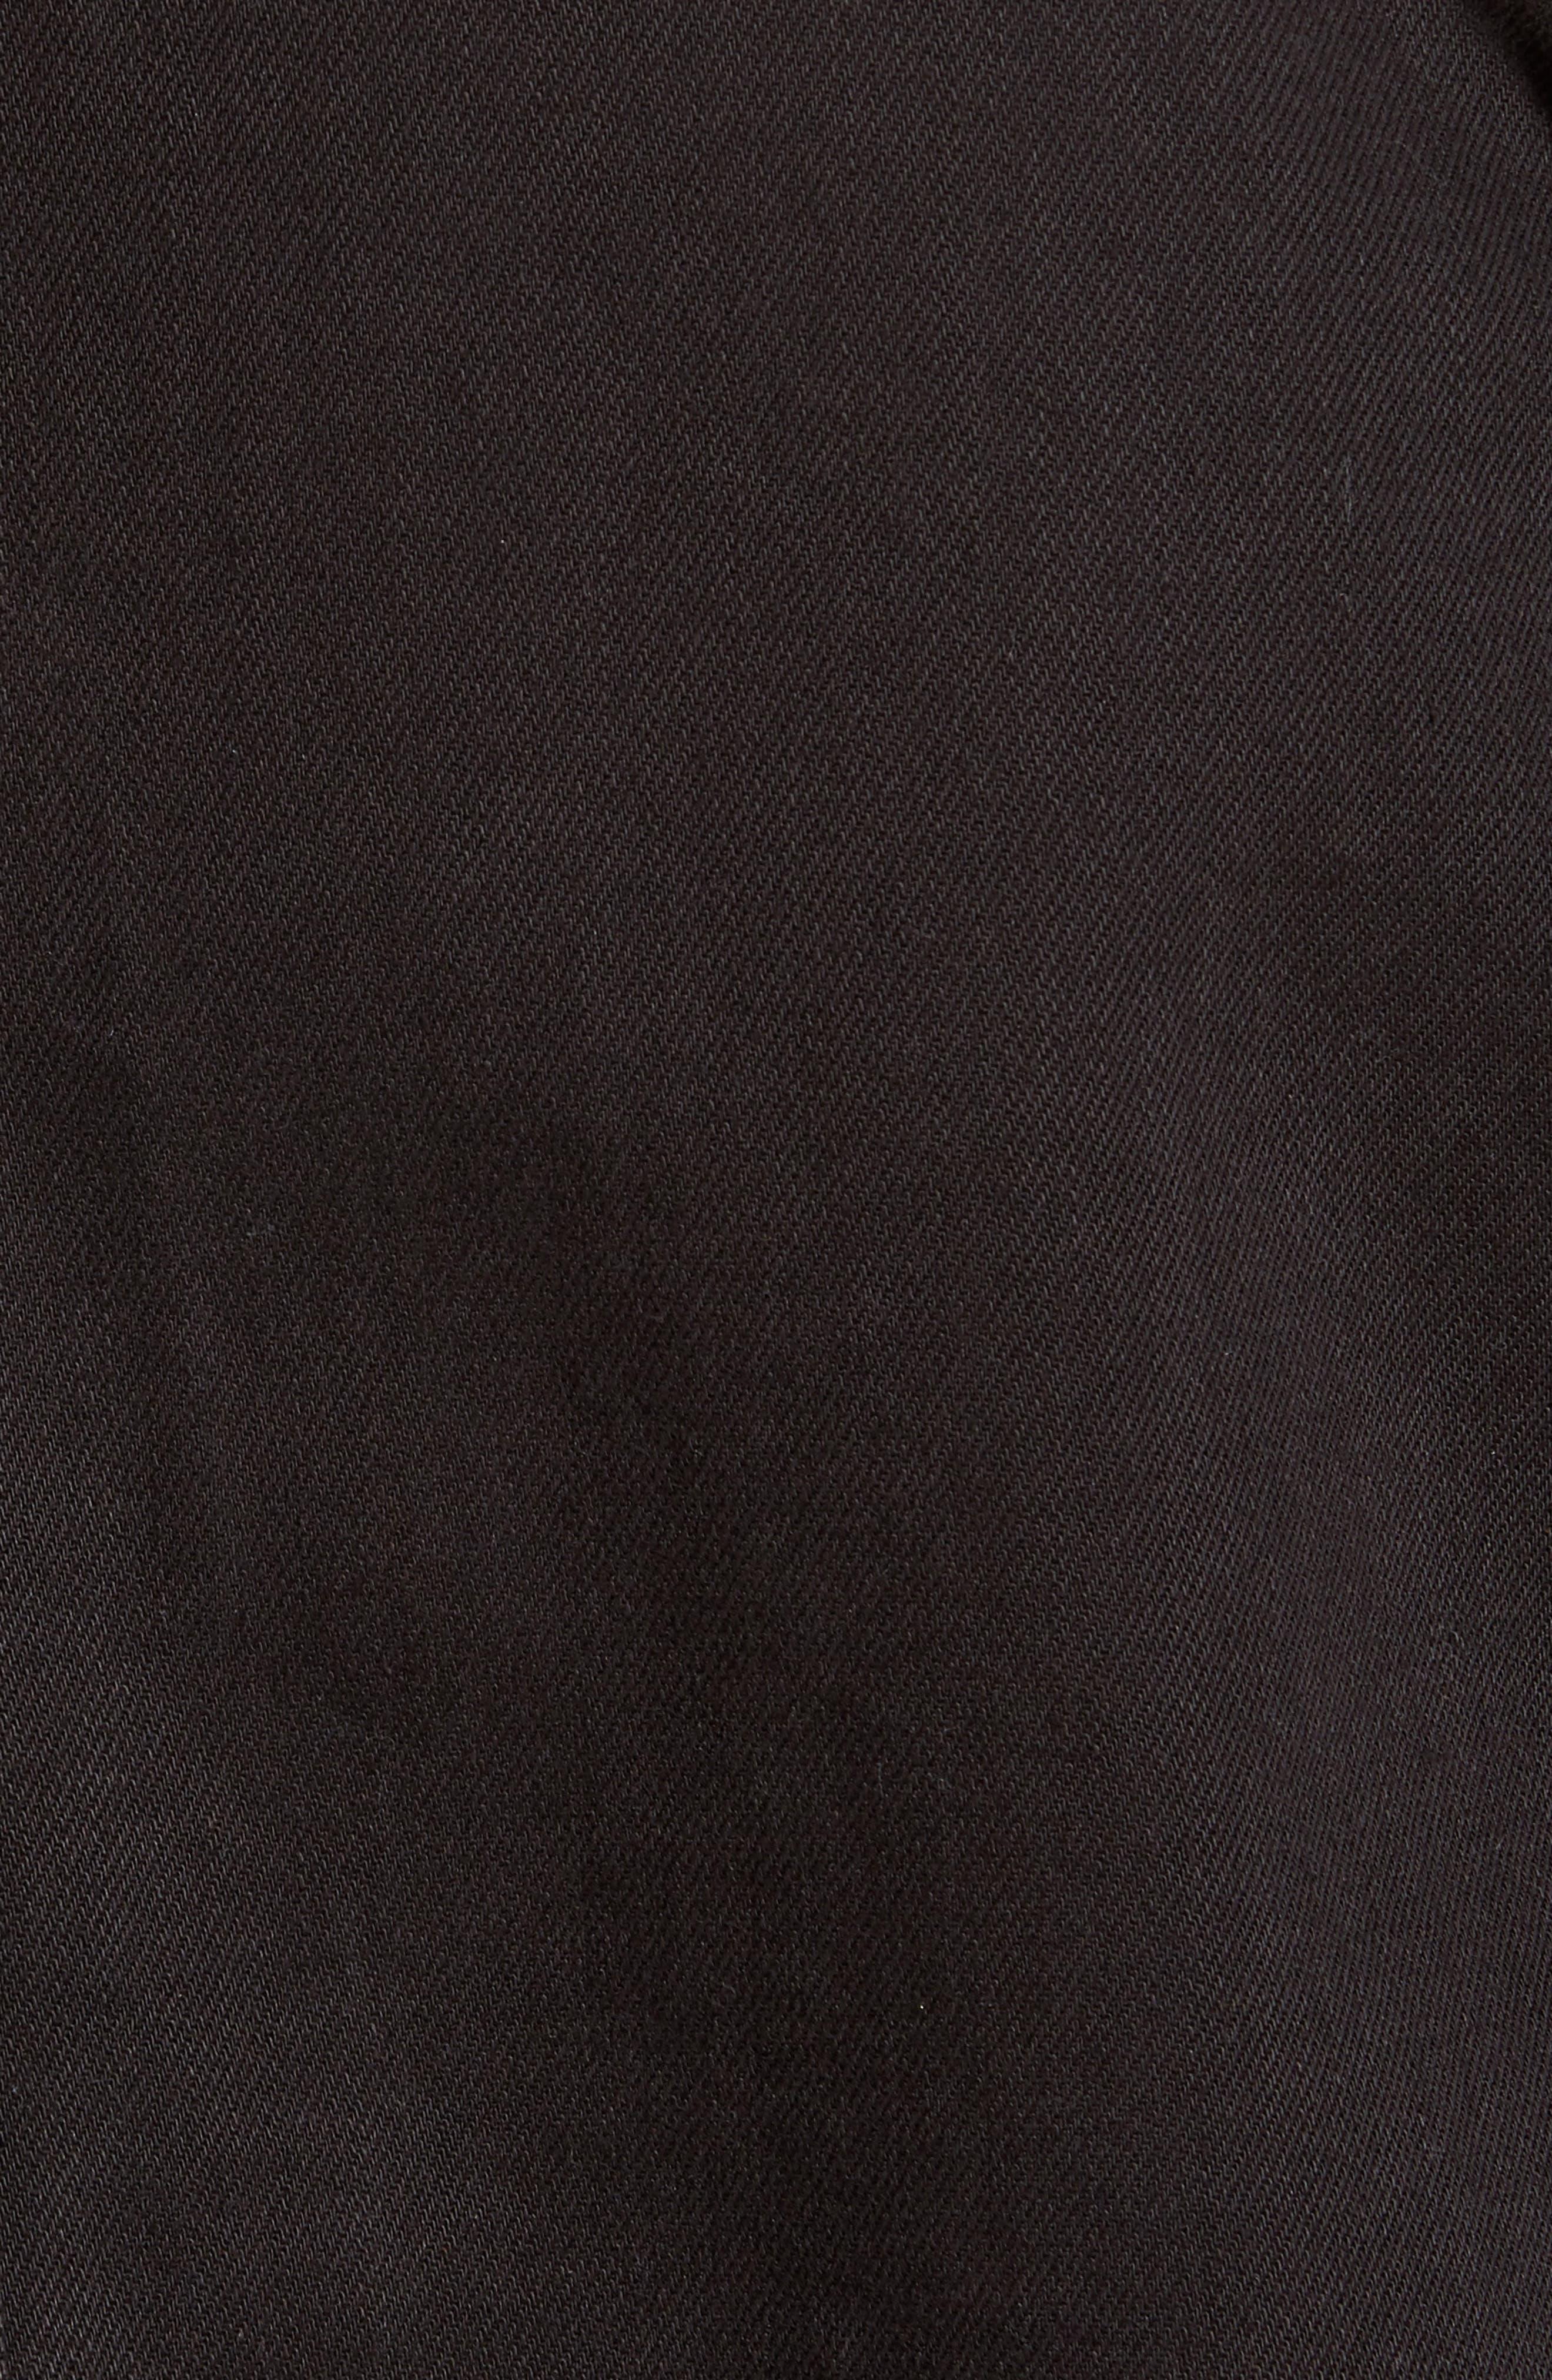 Woodbine Jacket,                             Alternate thumbnail 5, color,                             001